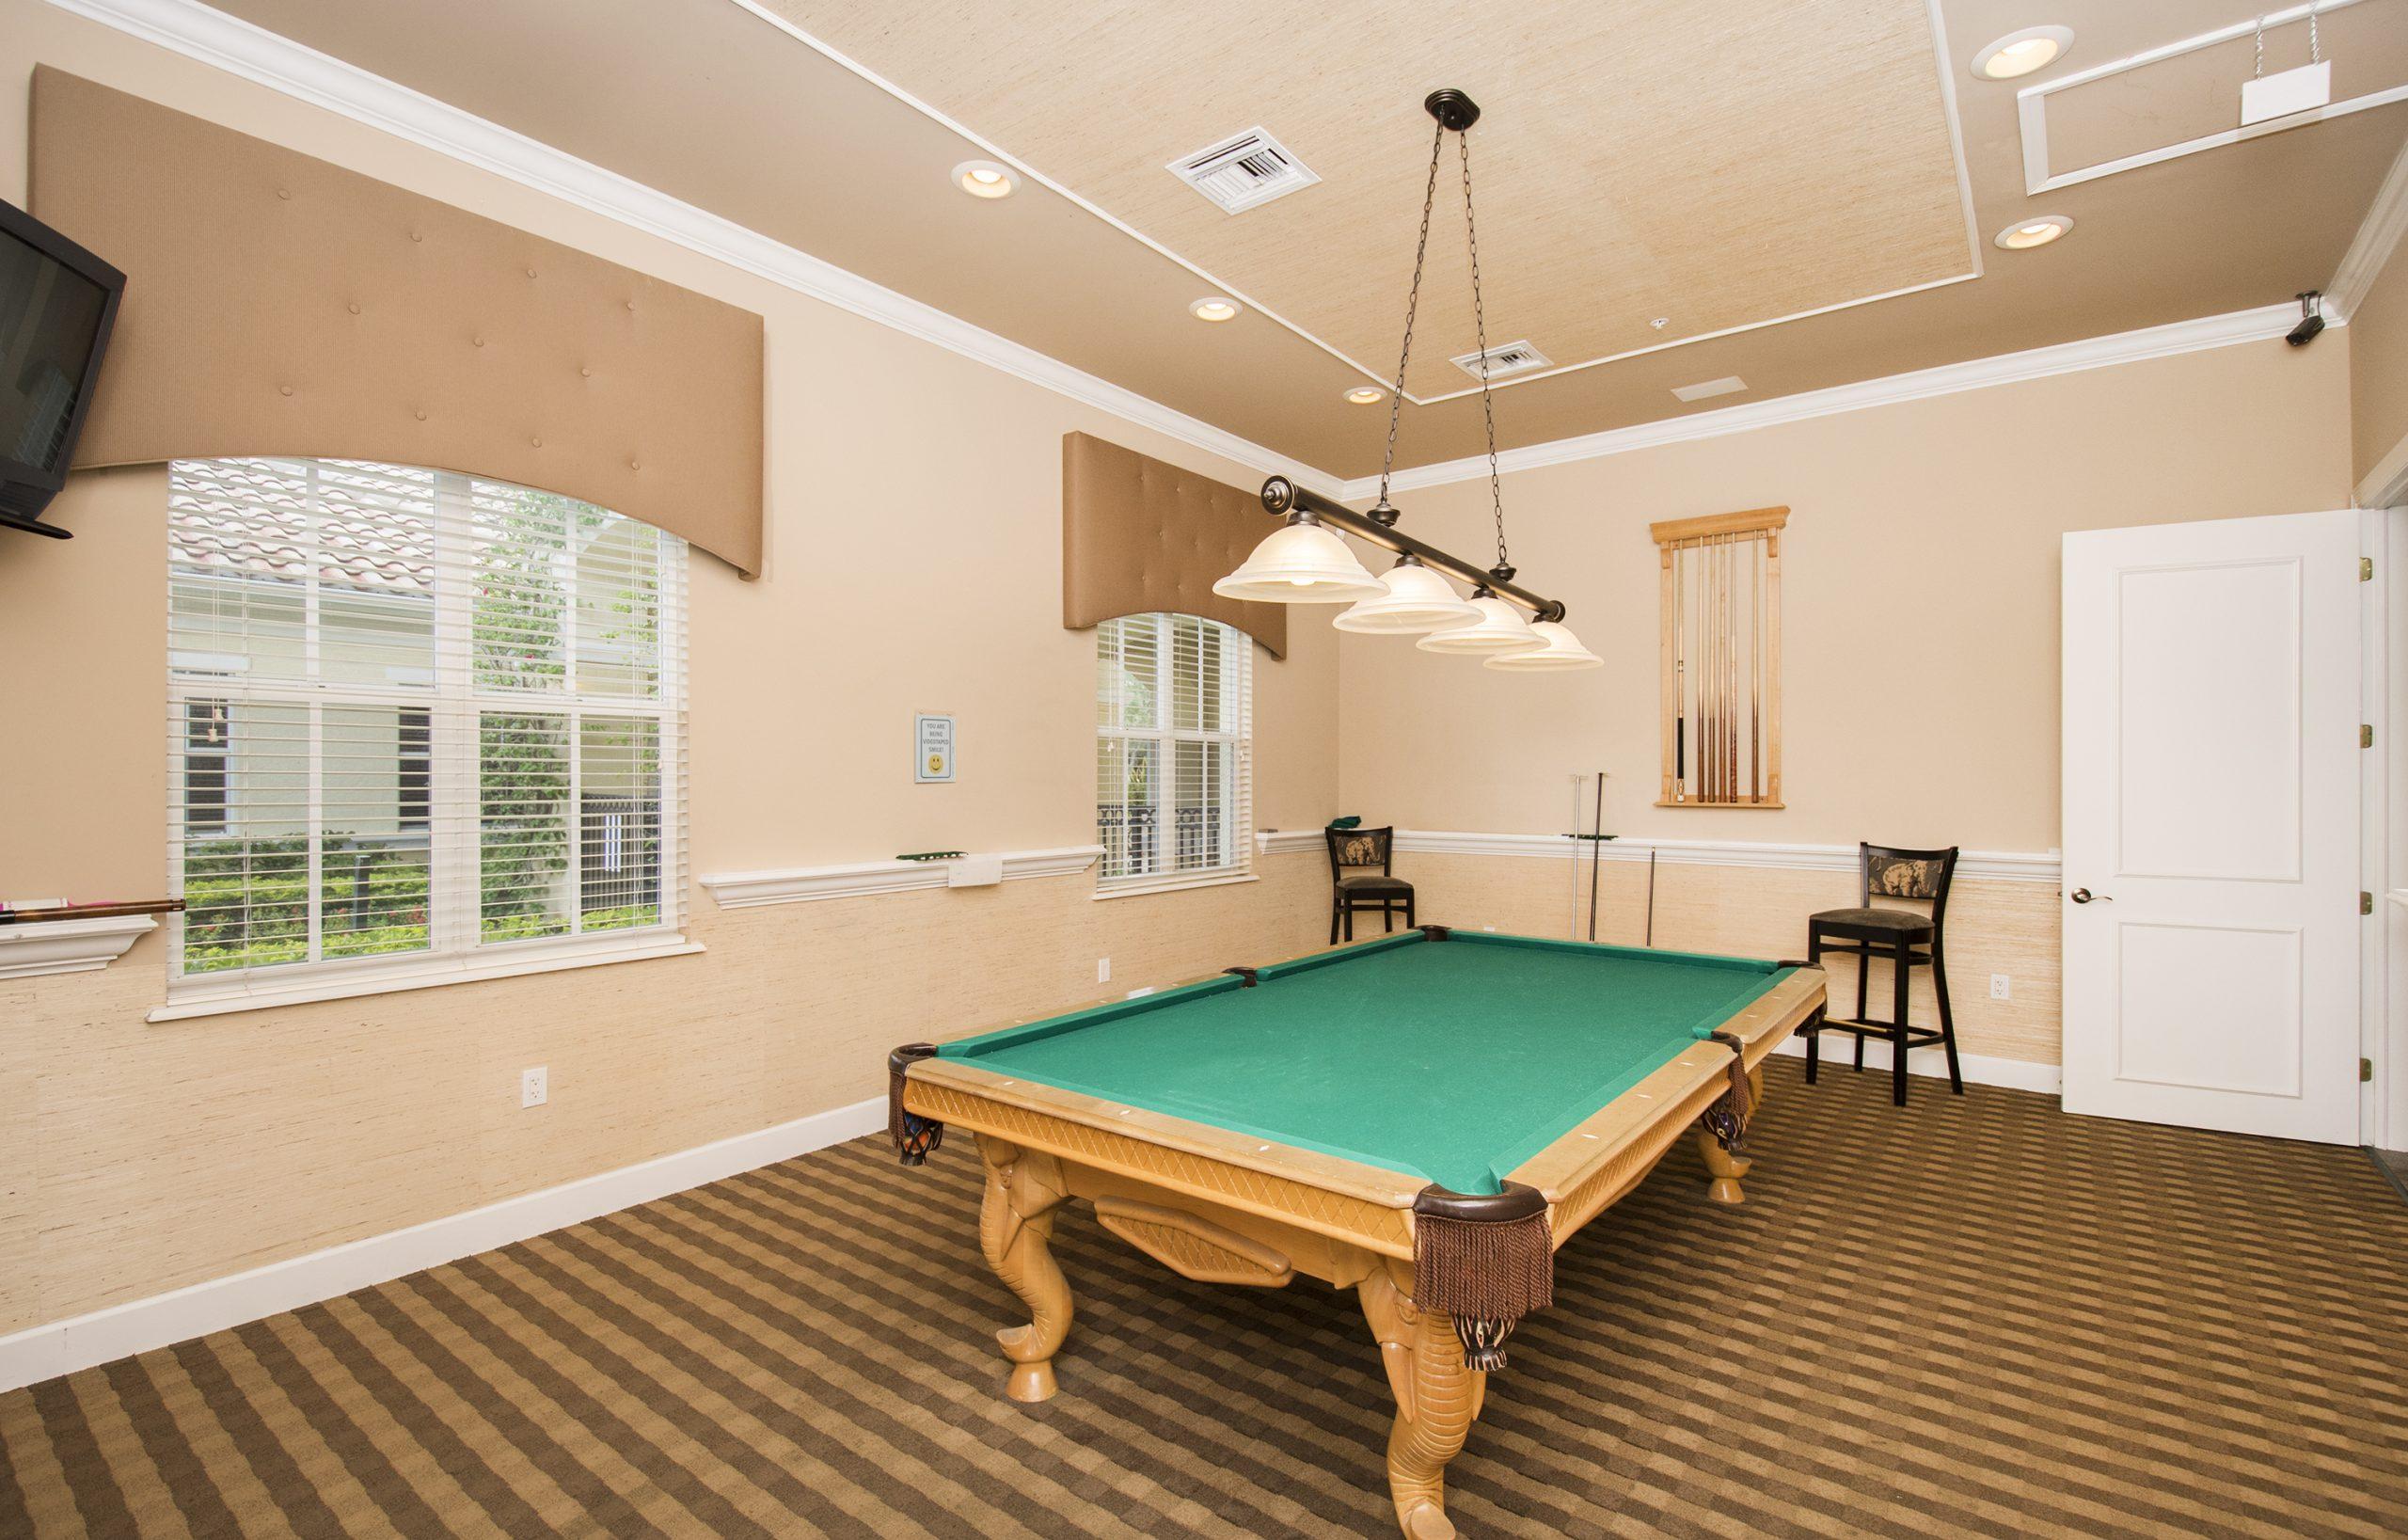 Pool Table | Tarpon Bay Community Association, Inc. - Naples, Florida